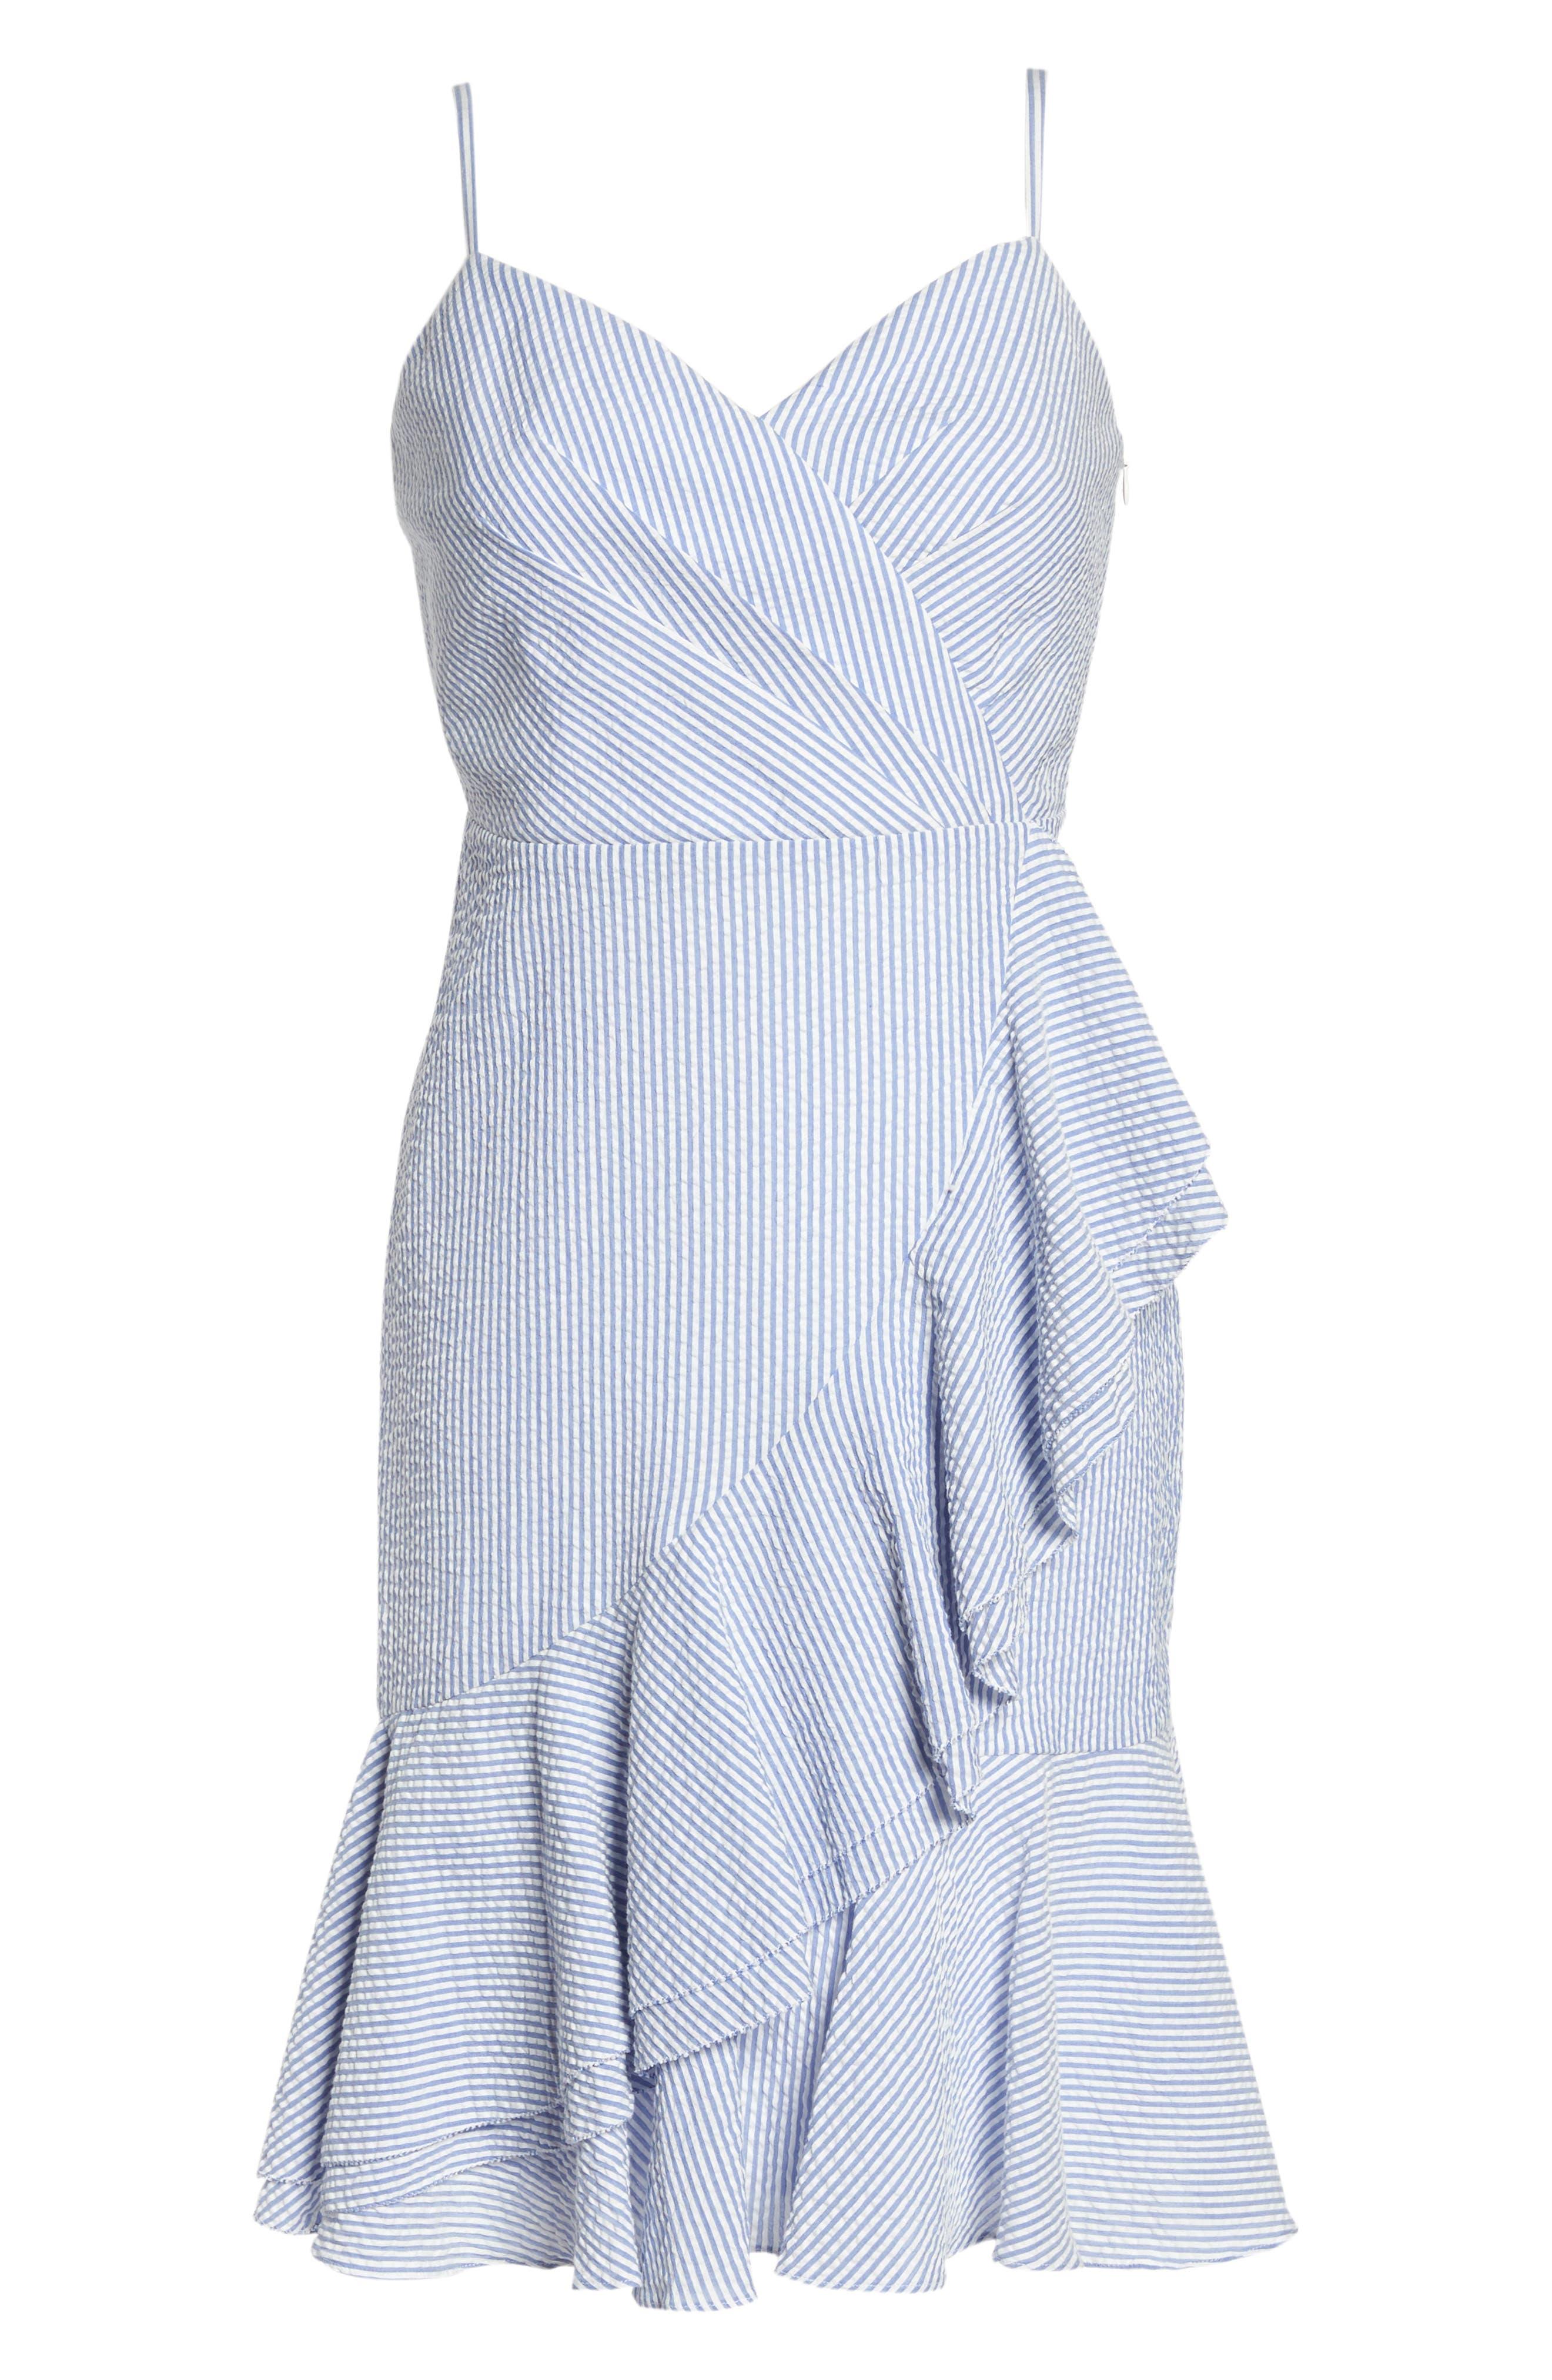 Spaghetti Strap Ruffle Dress,                             Alternate thumbnail 12, color,